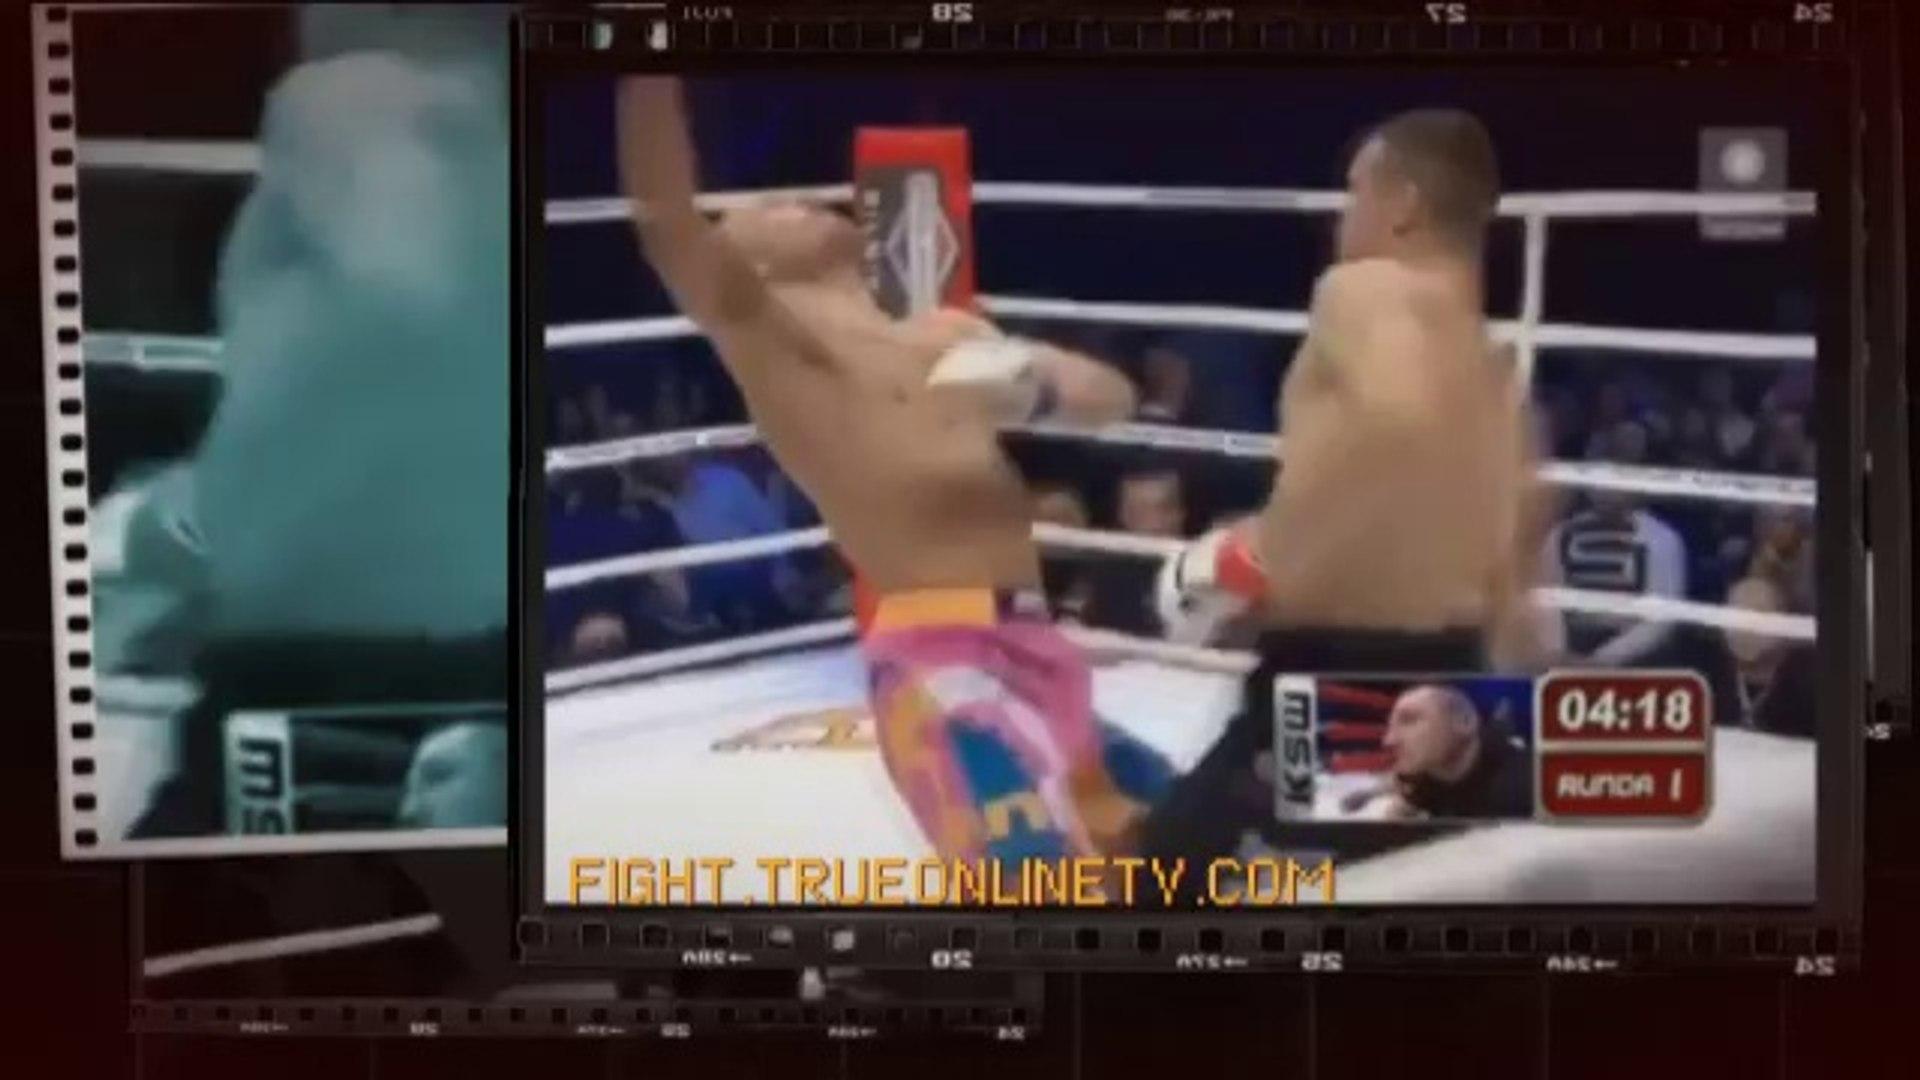 Watch Rafael Silva vs. Joe Warren - live BFC 118 stream - mma online - mma live stream - mma live -